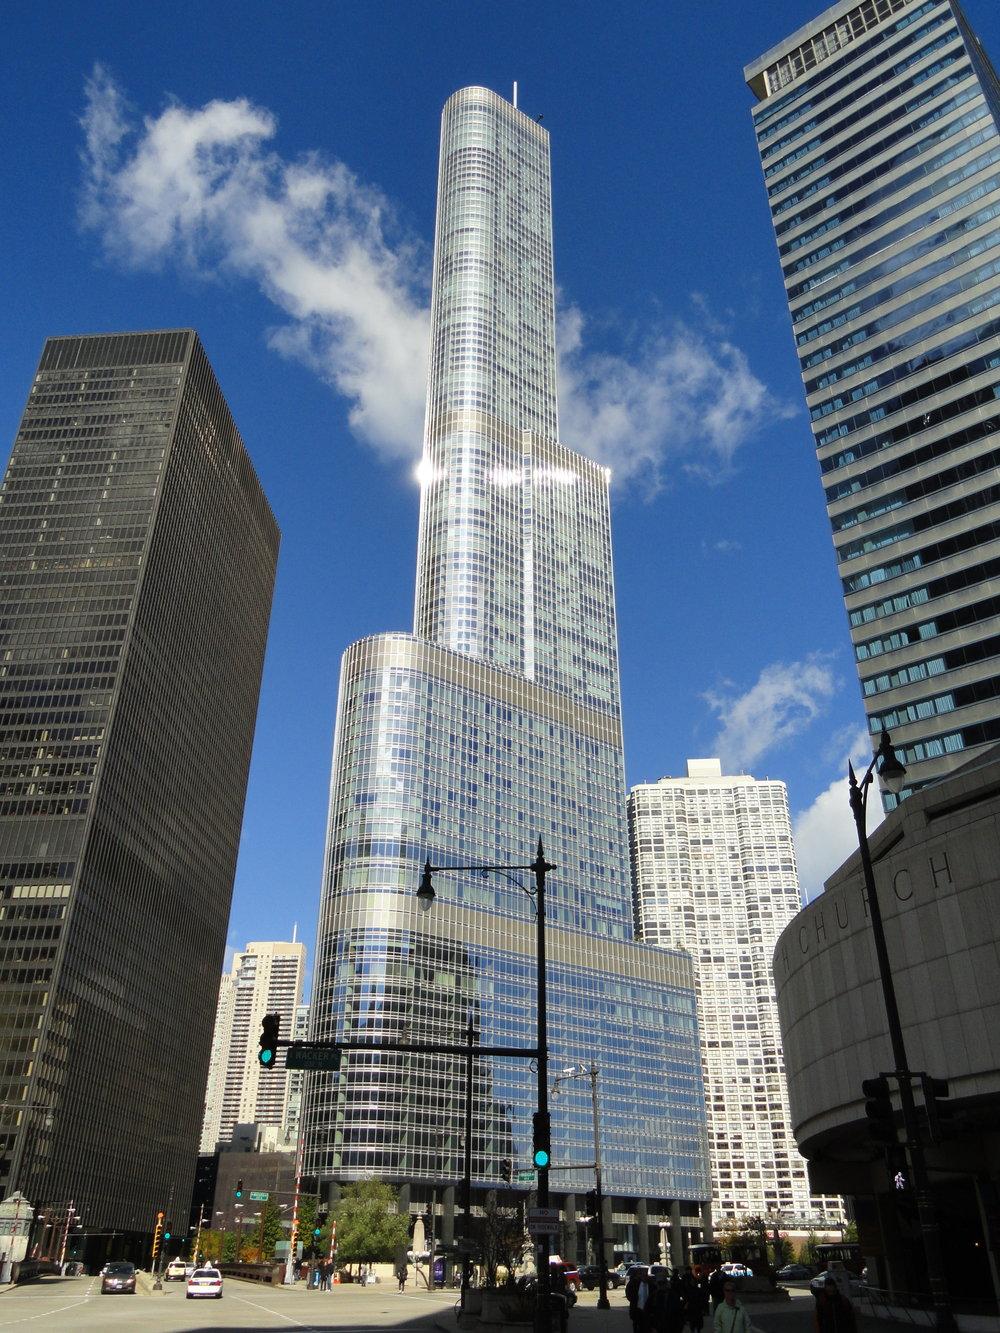 Trump_International_Hotel_and_Tower_(Chicago)_-_DSC09402.JPG